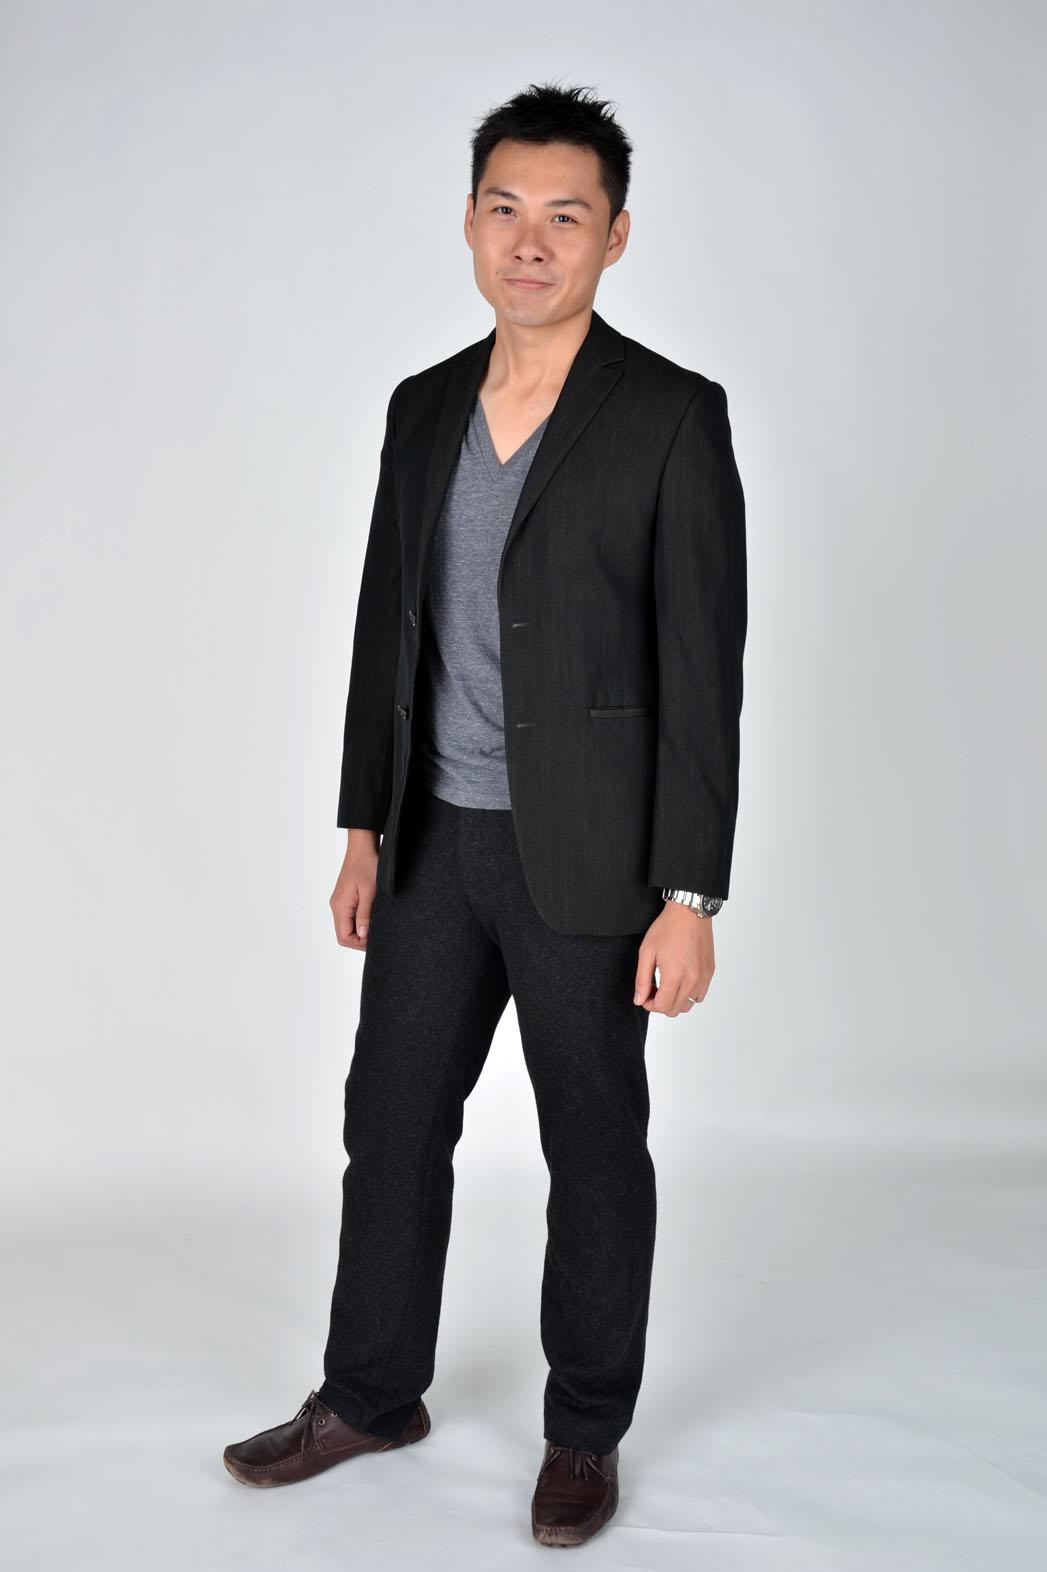 Anthony Chen Portrait - P 2013